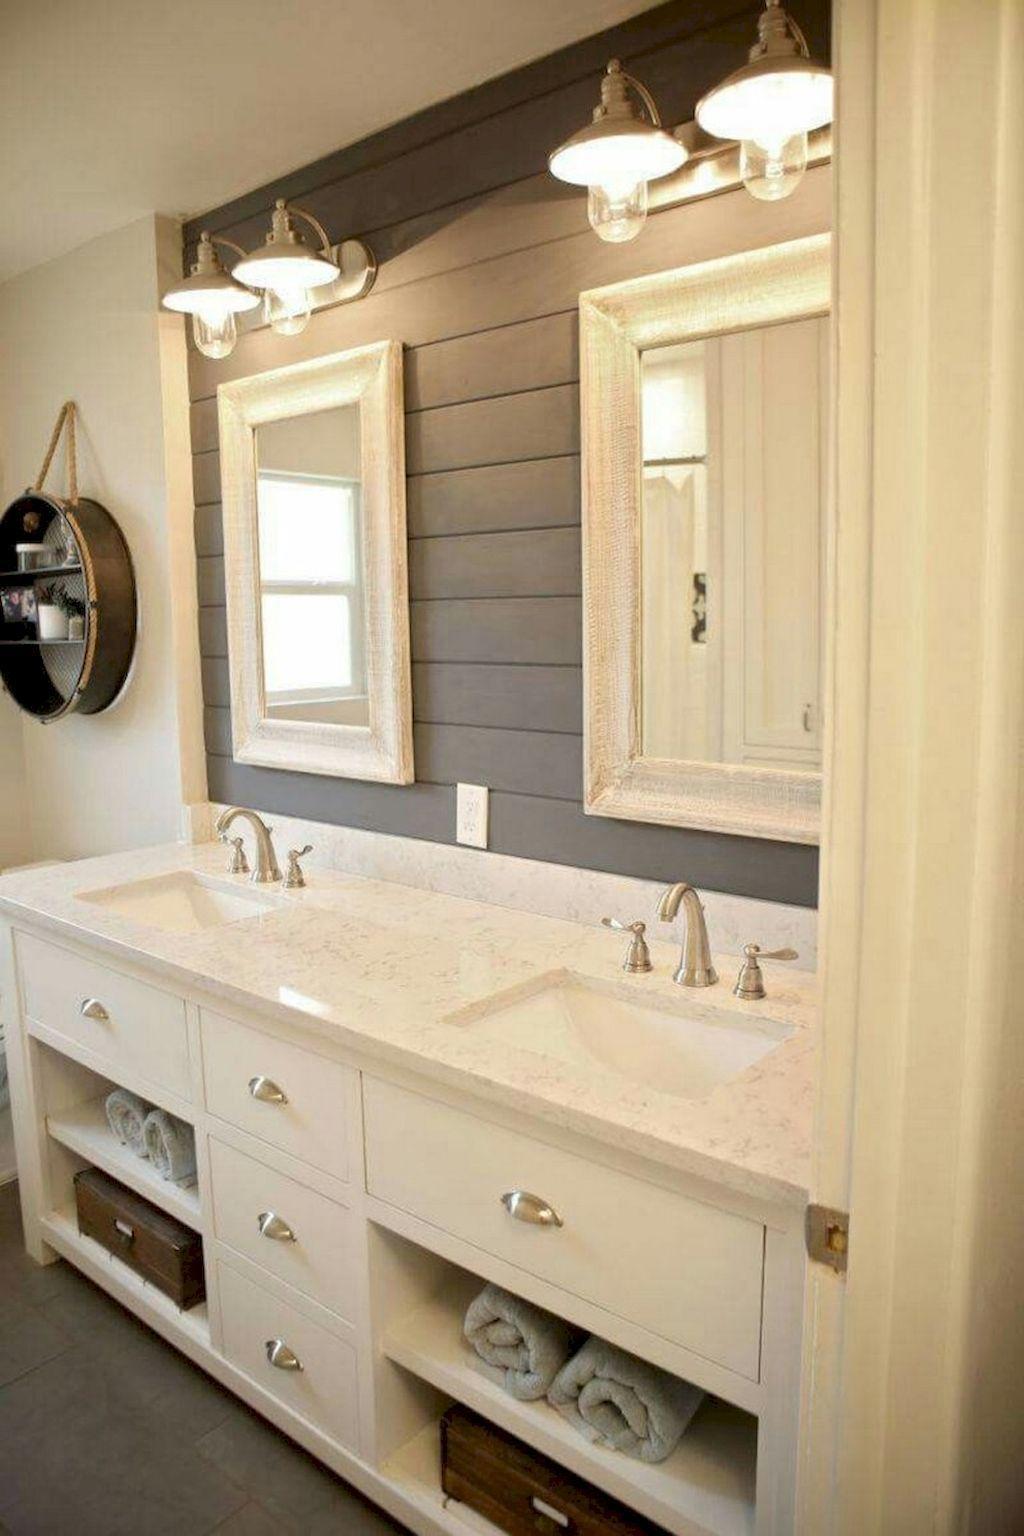 Making nautical bathroom d 233 cor by yourself bathroom designs ideas - Vintage Farmhouse Bathroom Remodel Ideas On A Budget 8